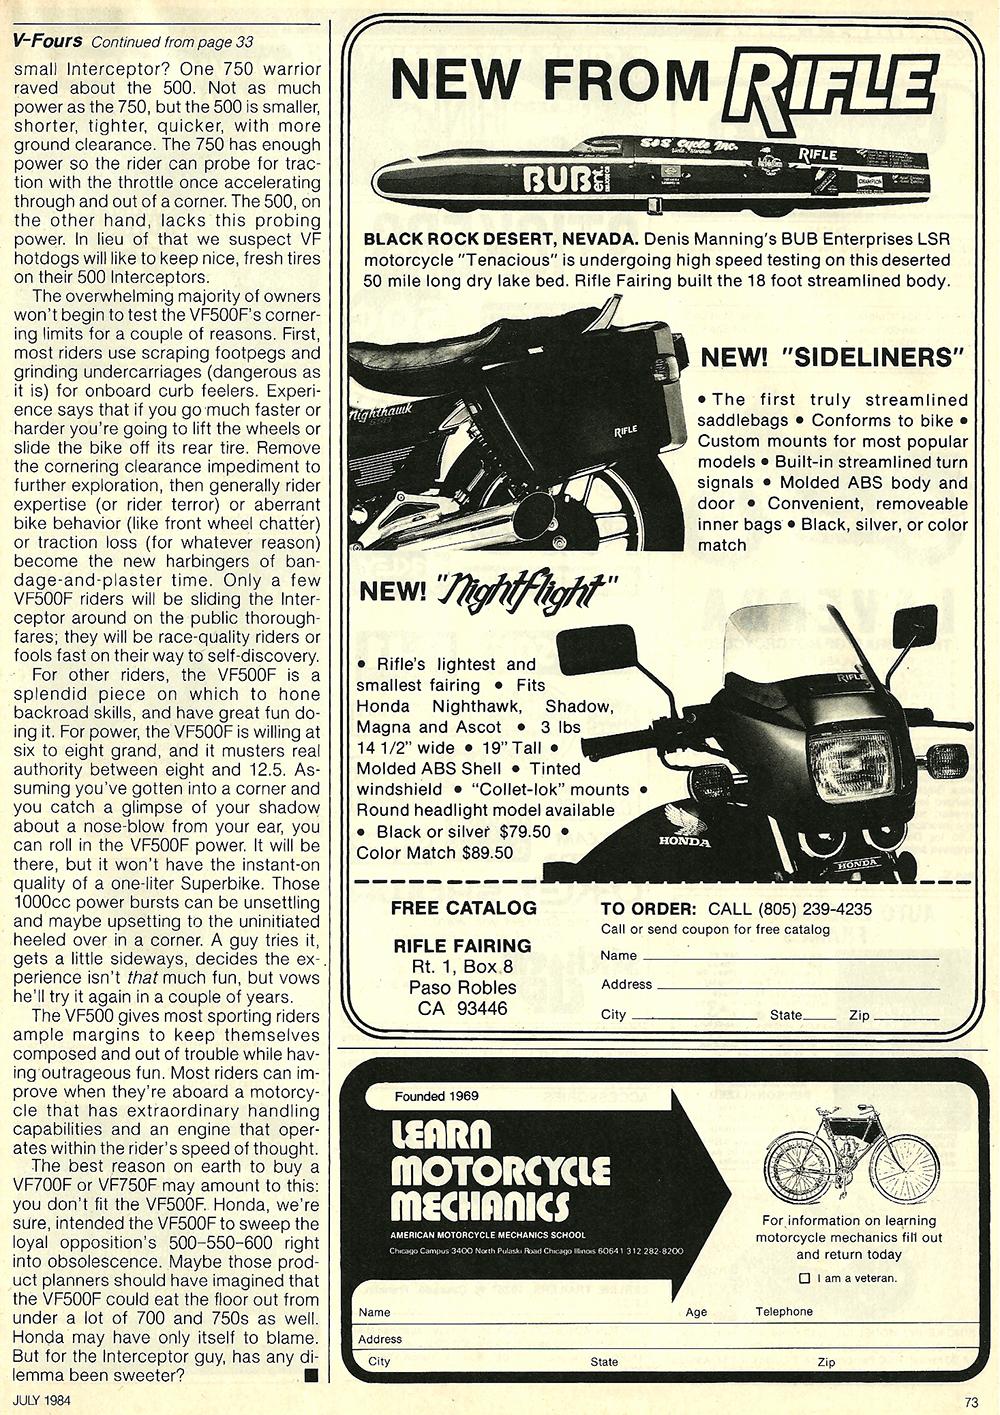 1984 Honda V30 Magna and VF500F Interceptor road test 11.jpg